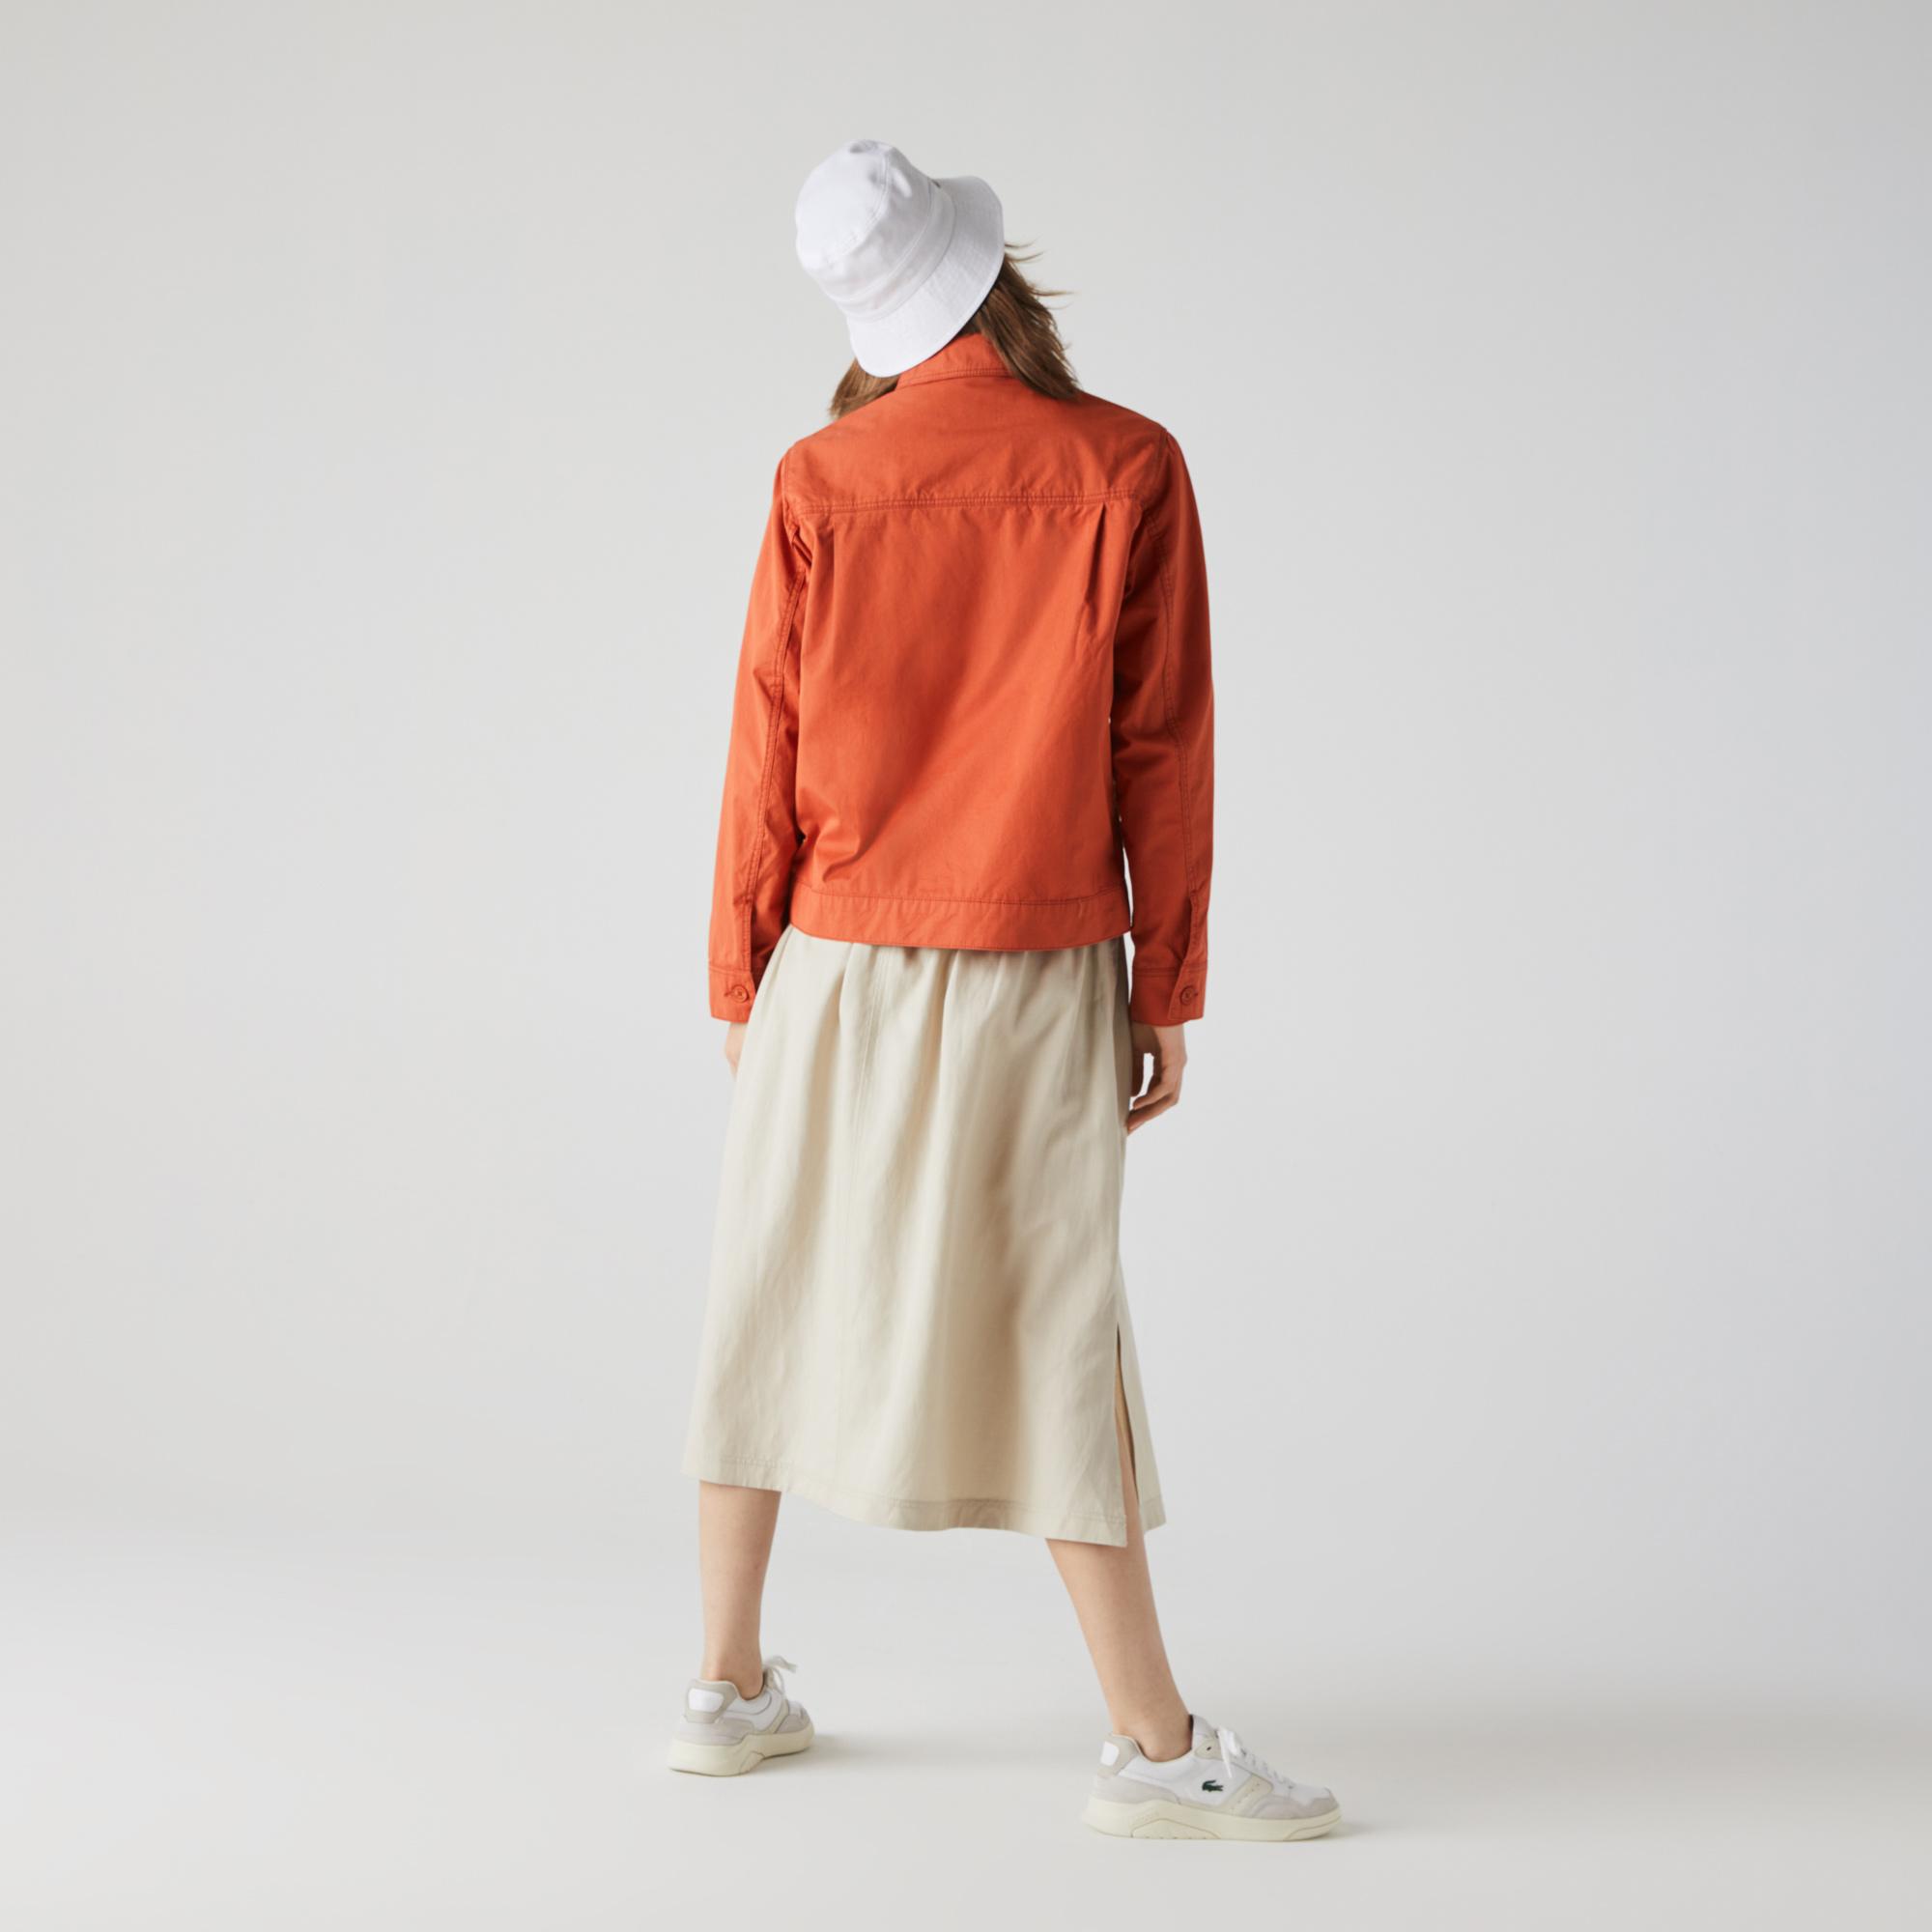 Lacoste Women's Light Cotton Fabric Jacket